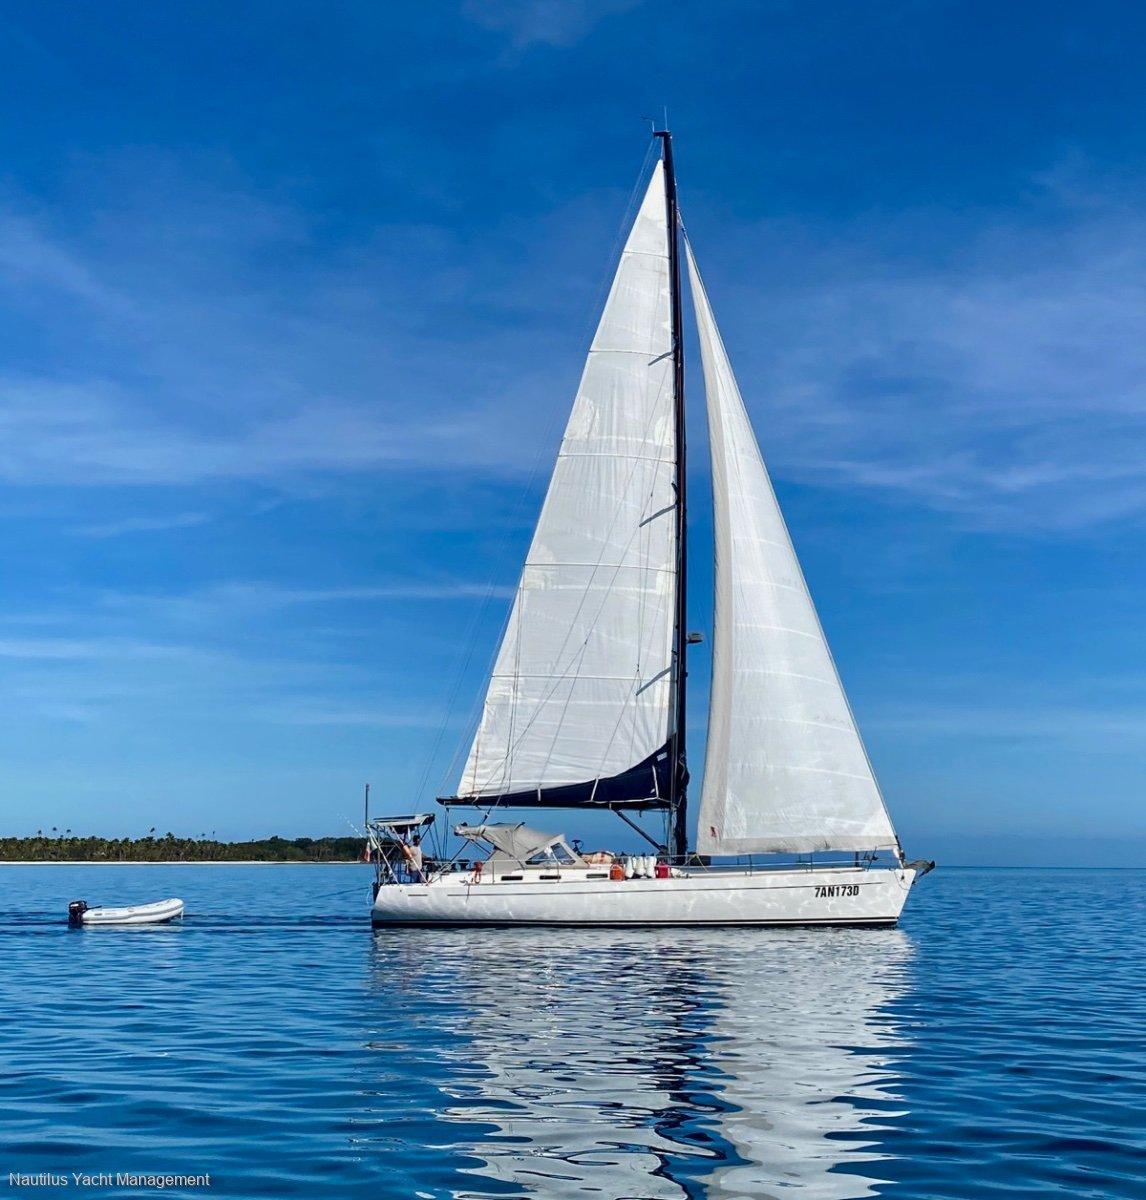 53' Finot Design World Cruiser